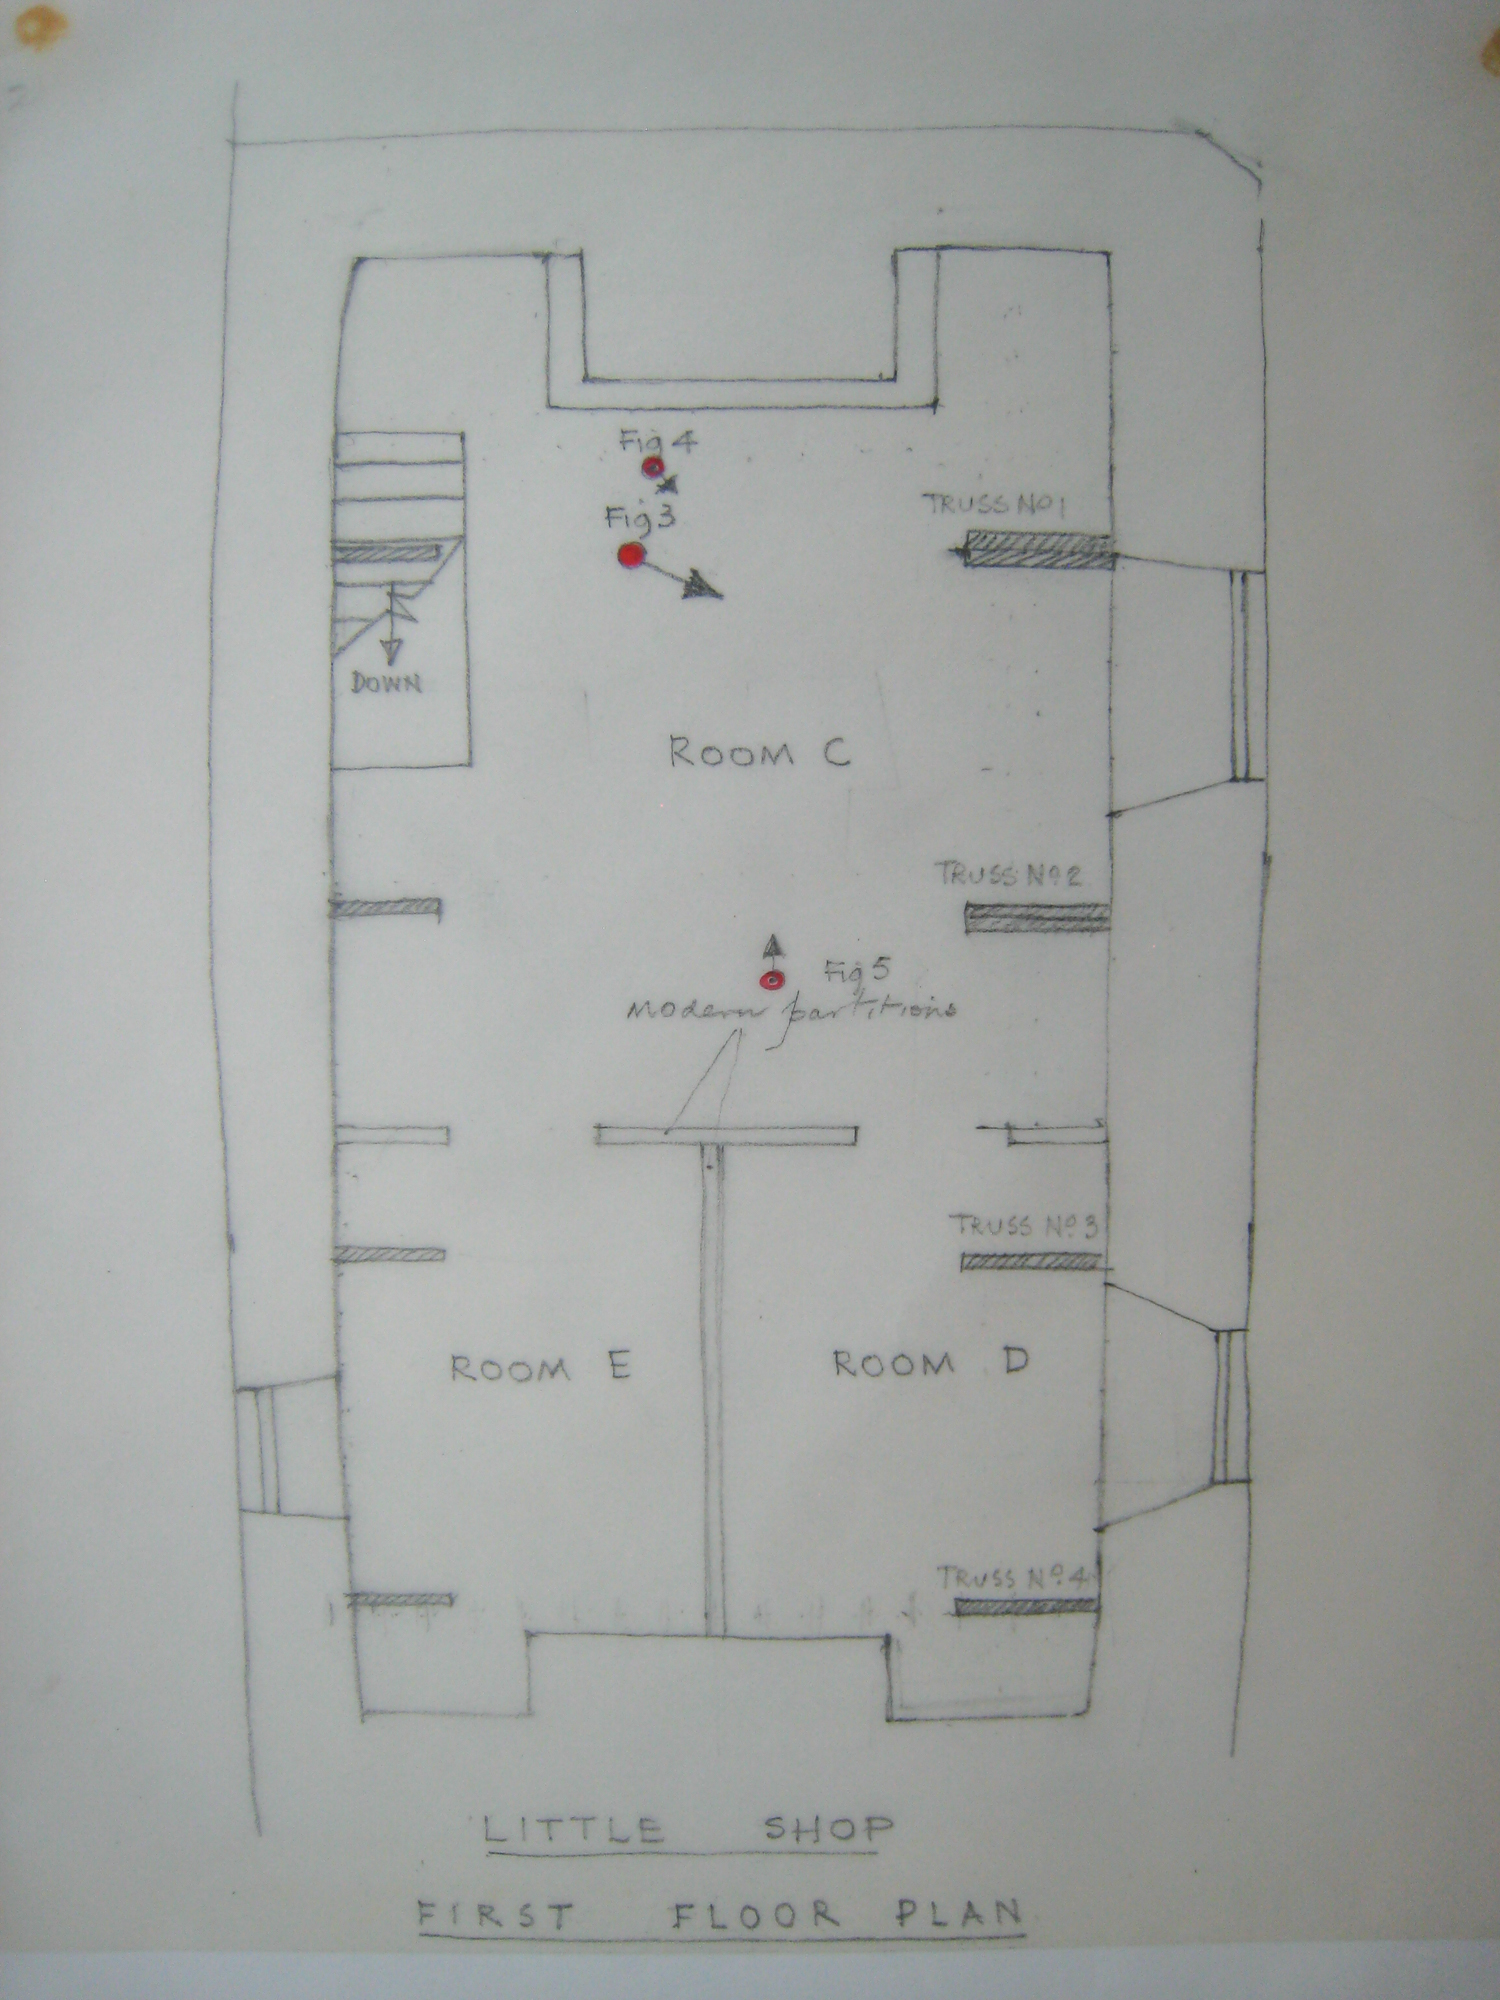 Little Shop: upstairs plan